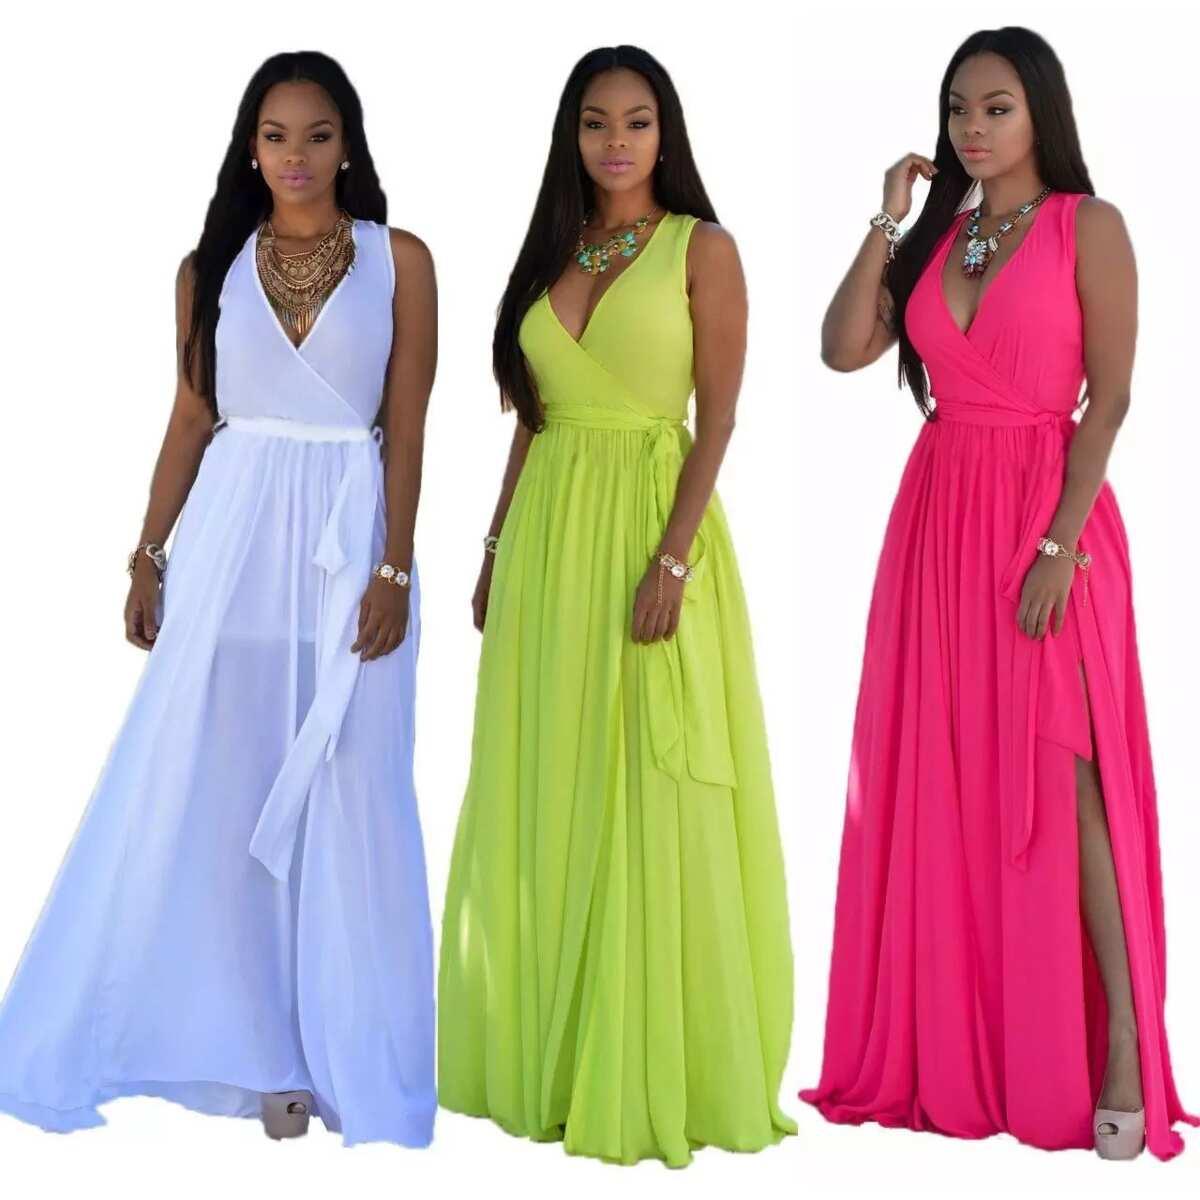 940233266a9 Latest chiffon styles in Nigeria to wear in 2018 ▷ Legit.ng